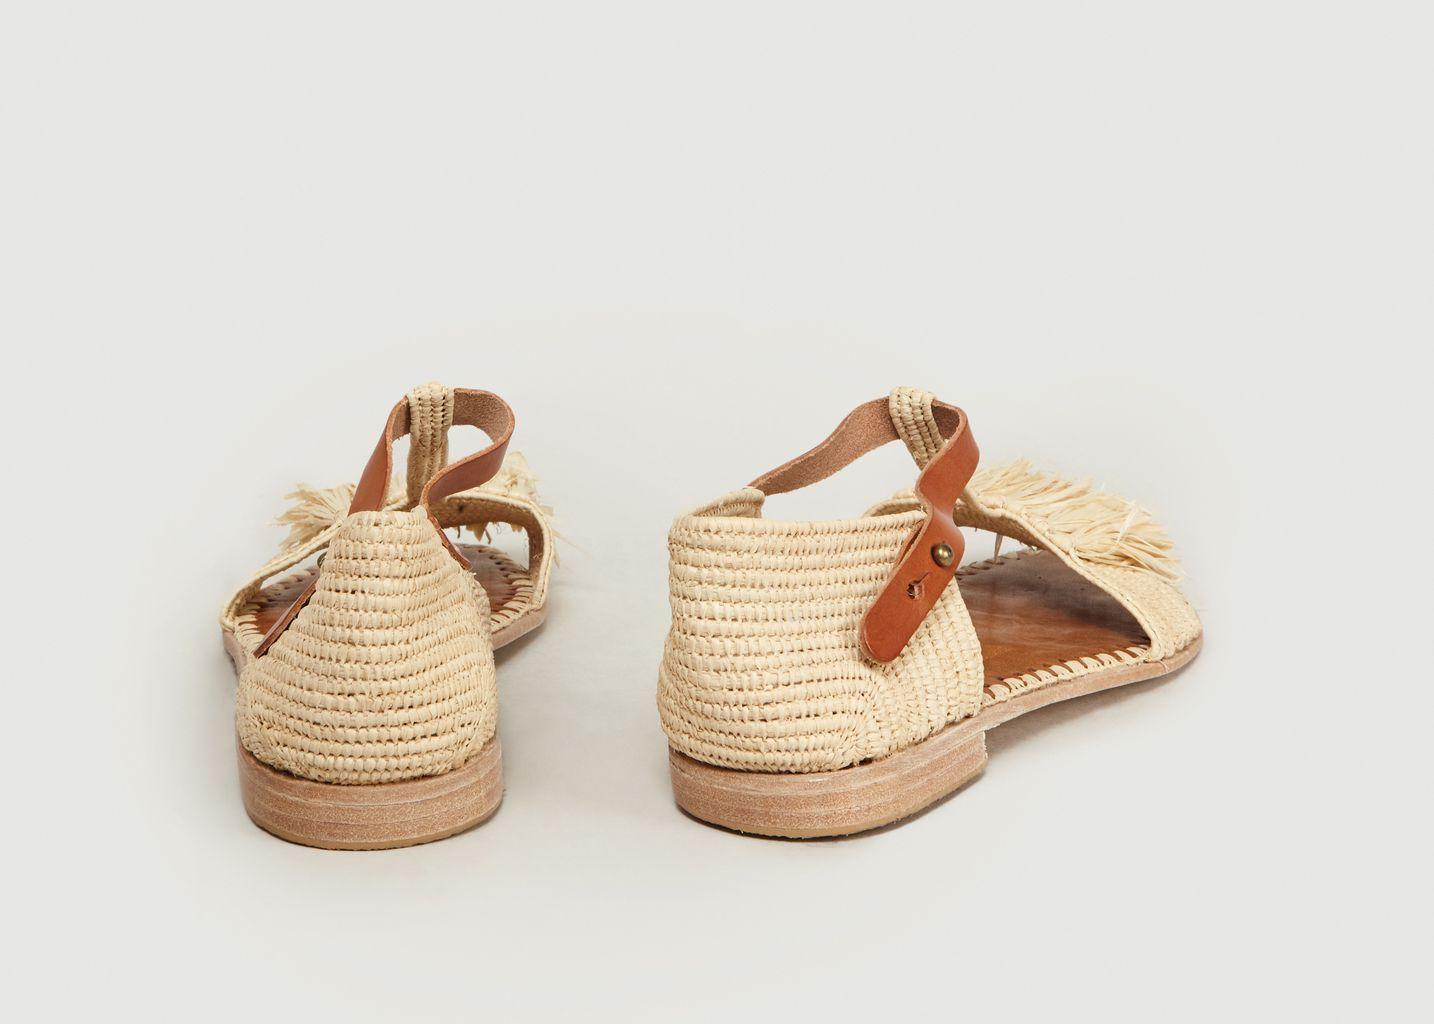 Sandales Gigi Lola - Yvonne Waska